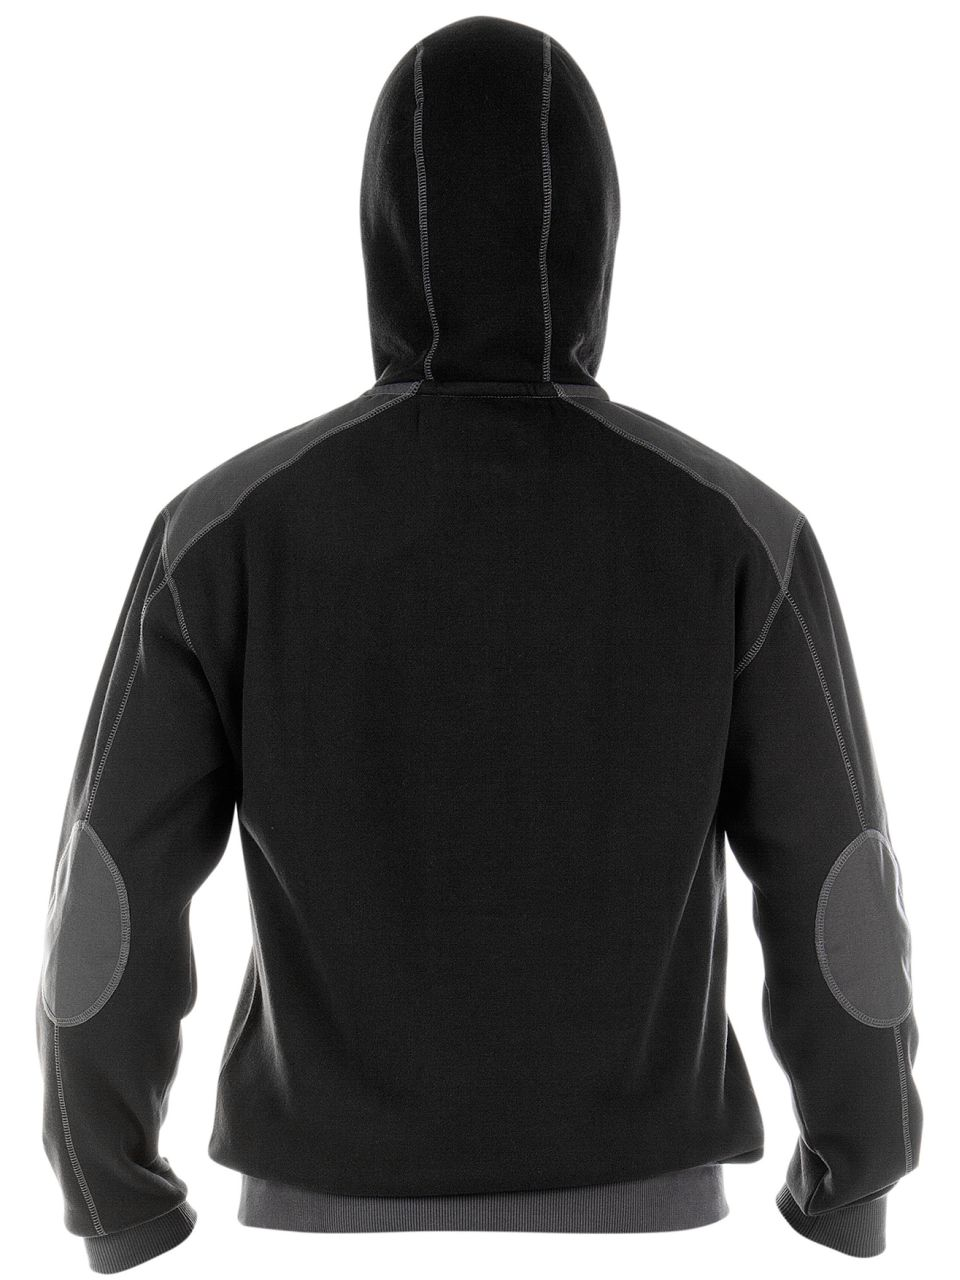 DASSY INDY Hoody Sweatshirt Kapuzensweatshirt schwarz//anthrazit